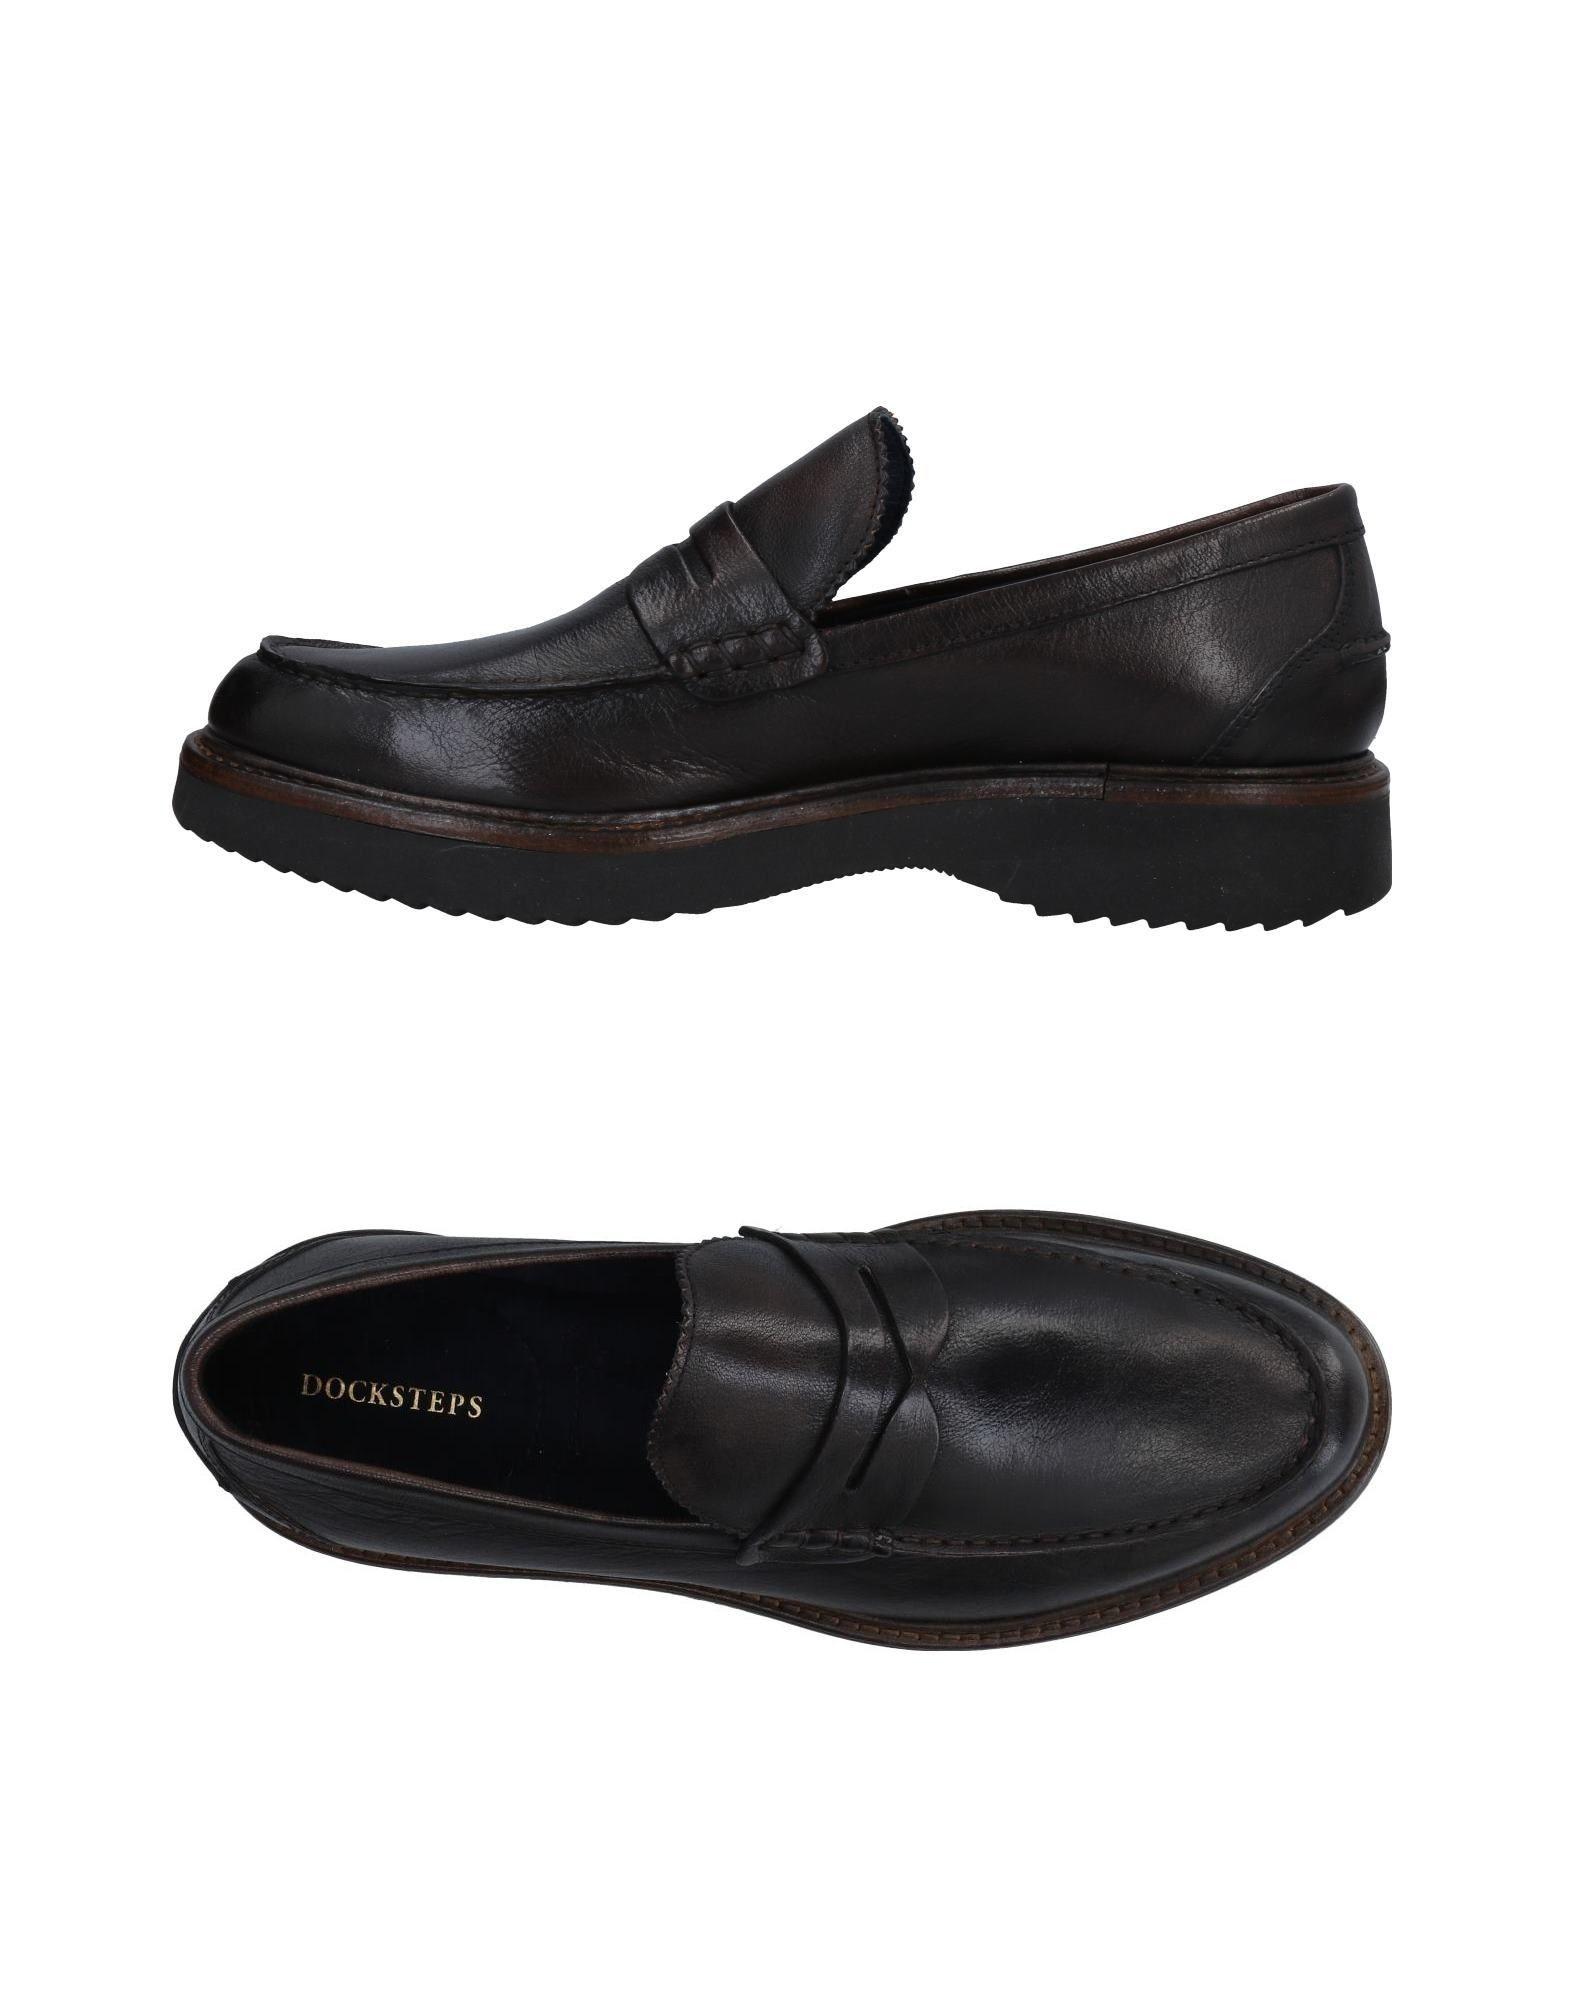 Rabatt echte Schuhe Docksteps Mokassins Herren  11477825WG